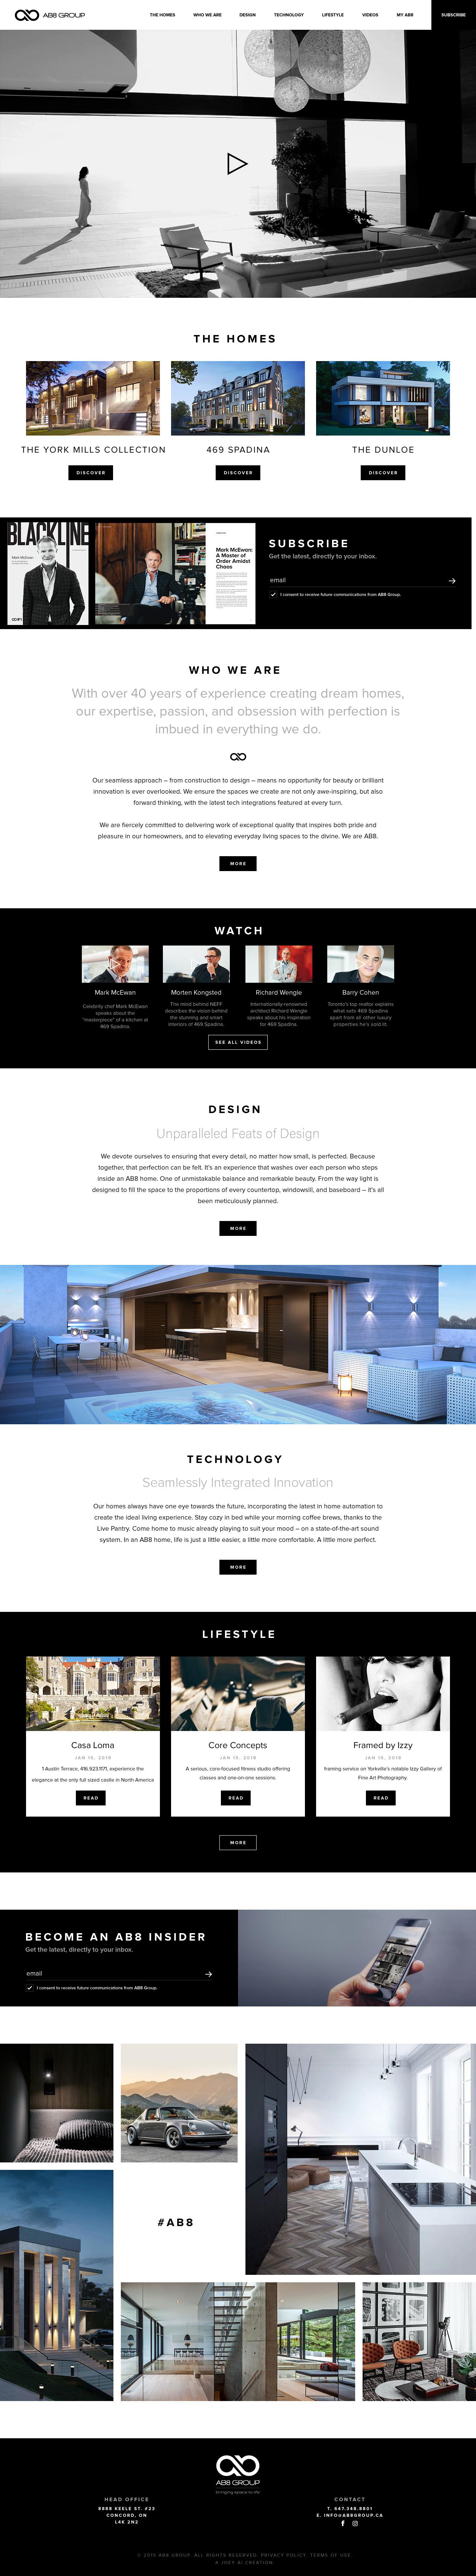 ab8 website